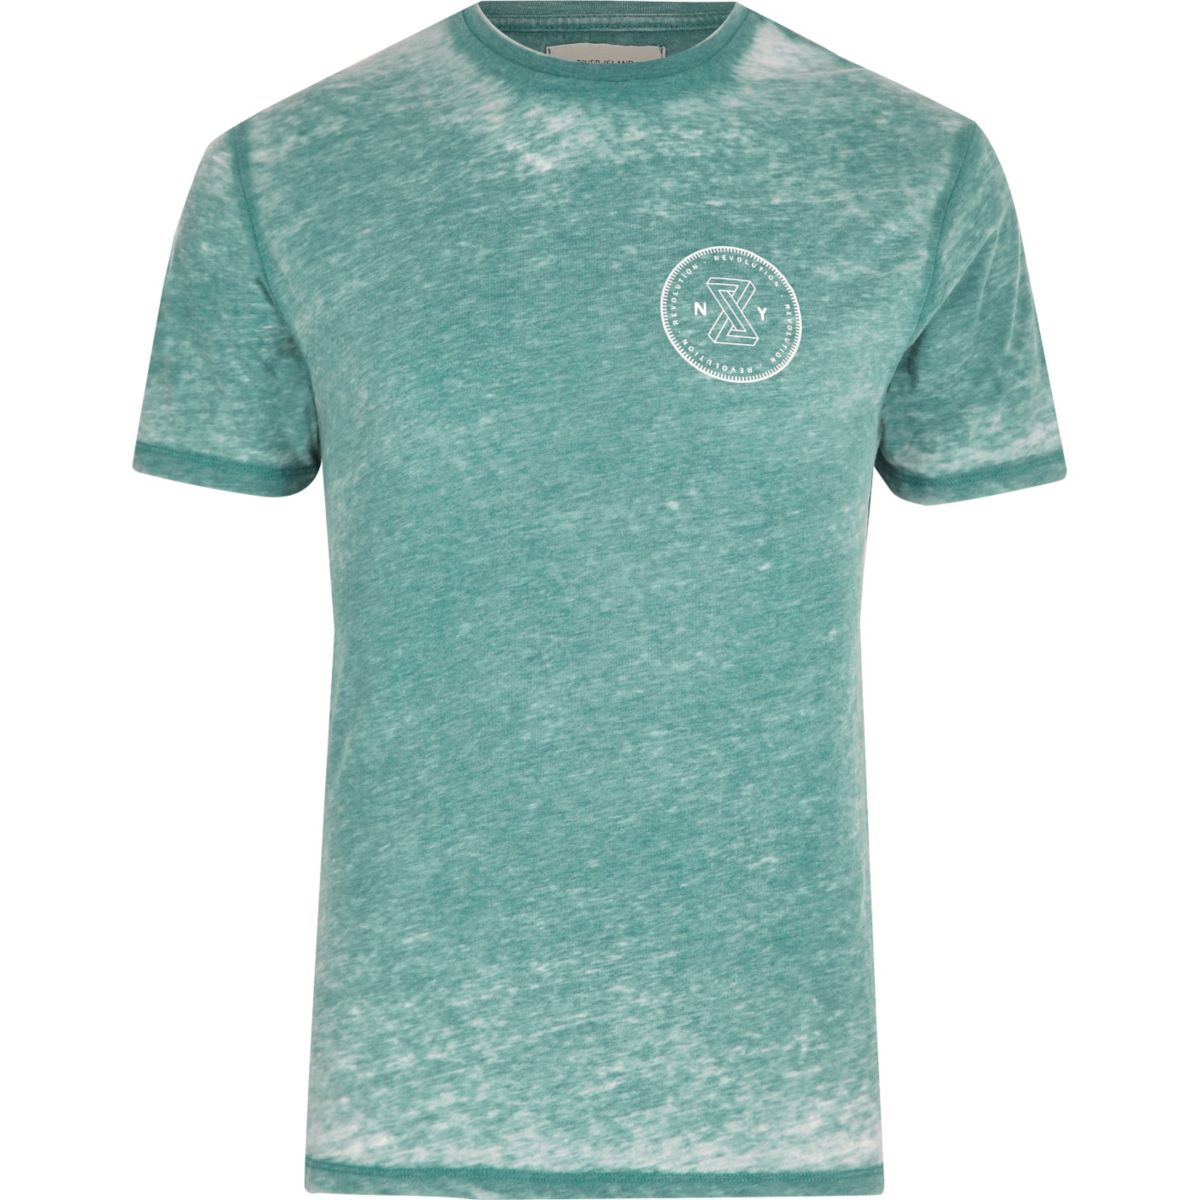 Mint green burnout slim fit T-shirt